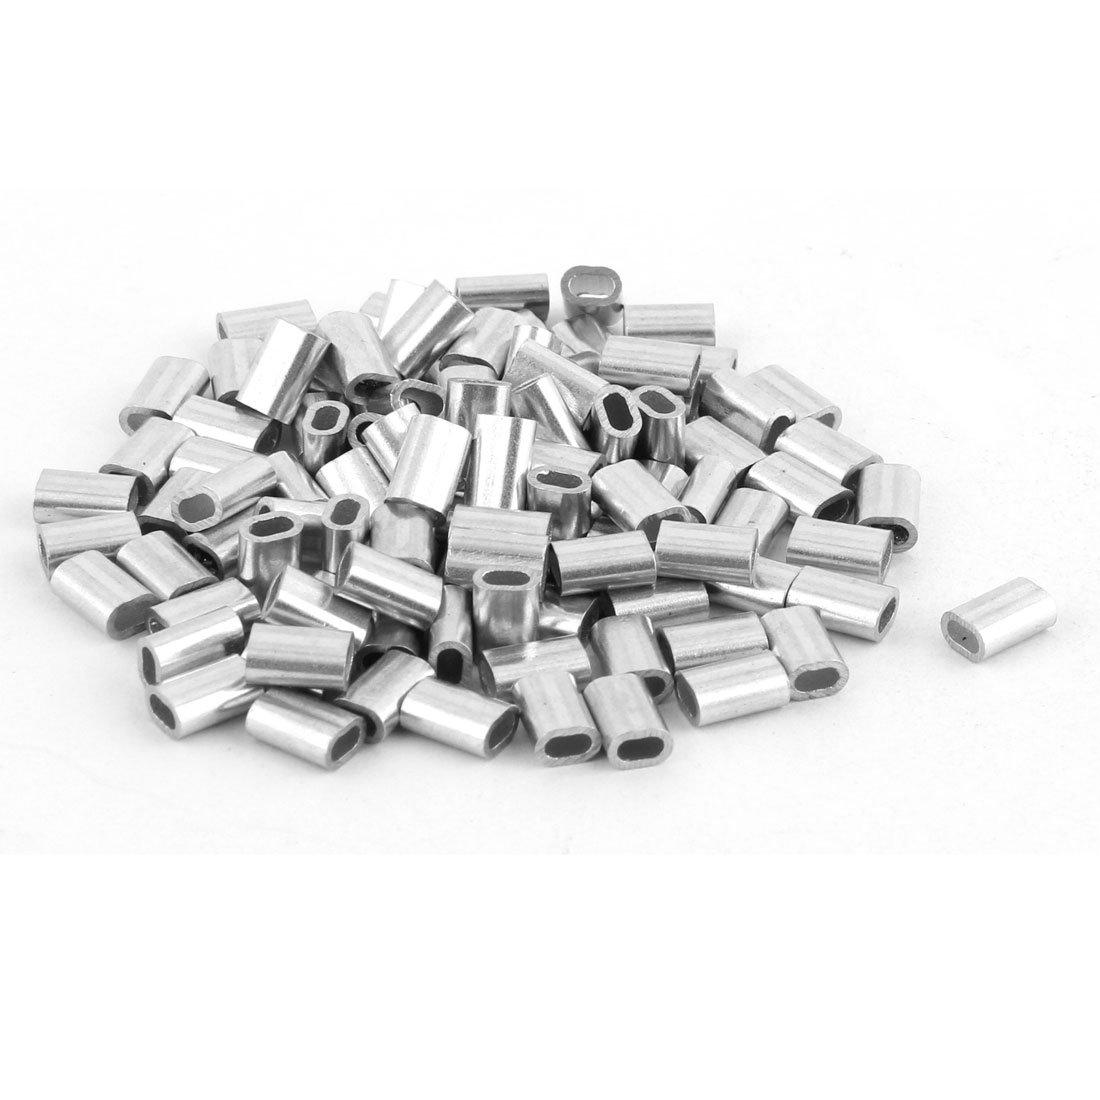 sourcingmap® Aluminium Hülsen Clip Ausstattung 5mm x 3mm für 1, 5mm Durchm. Stahl Drahtseil sourcing map a16041500ux0616